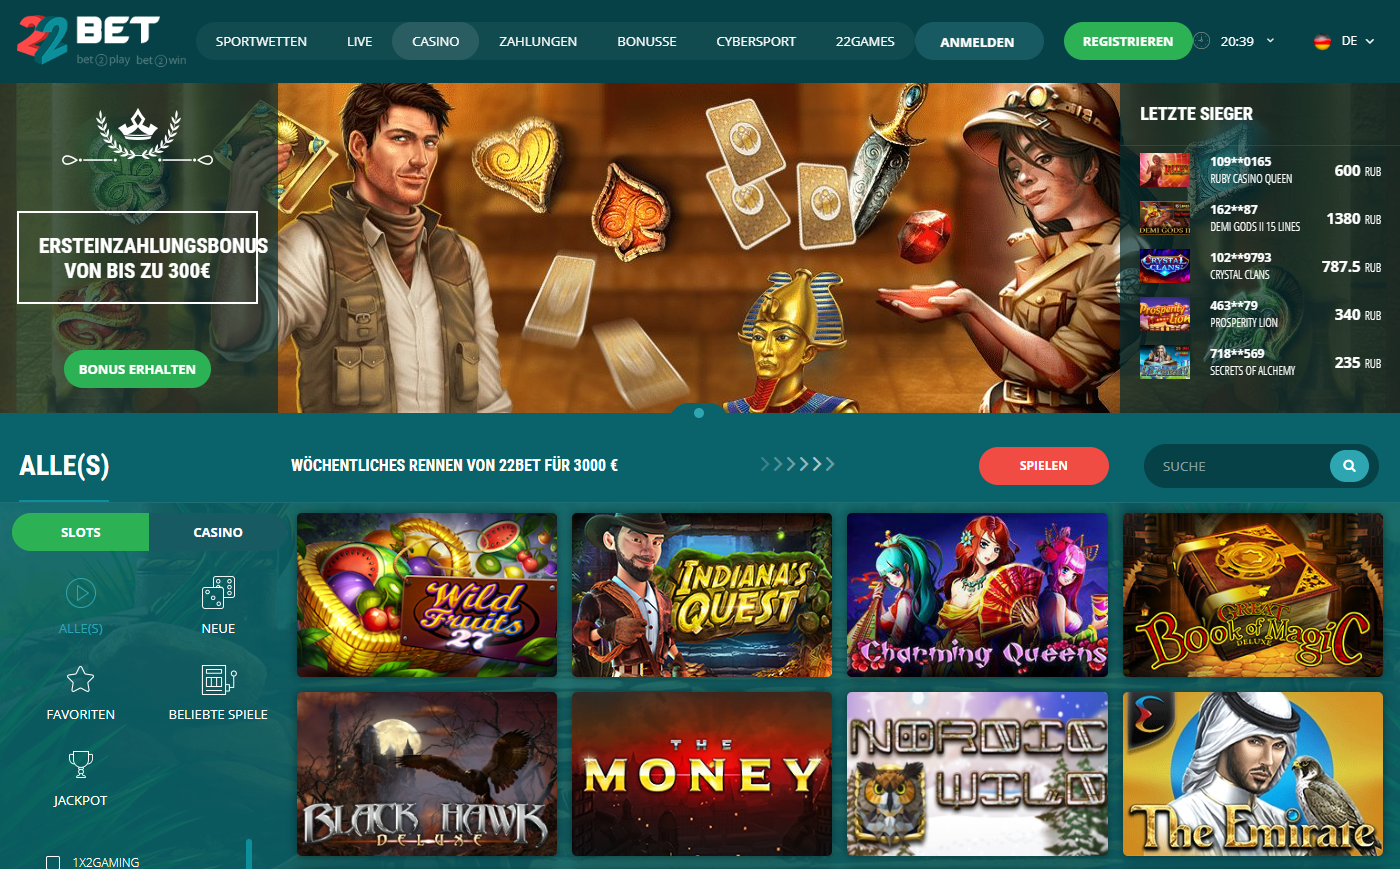 Casino Bewertung Online